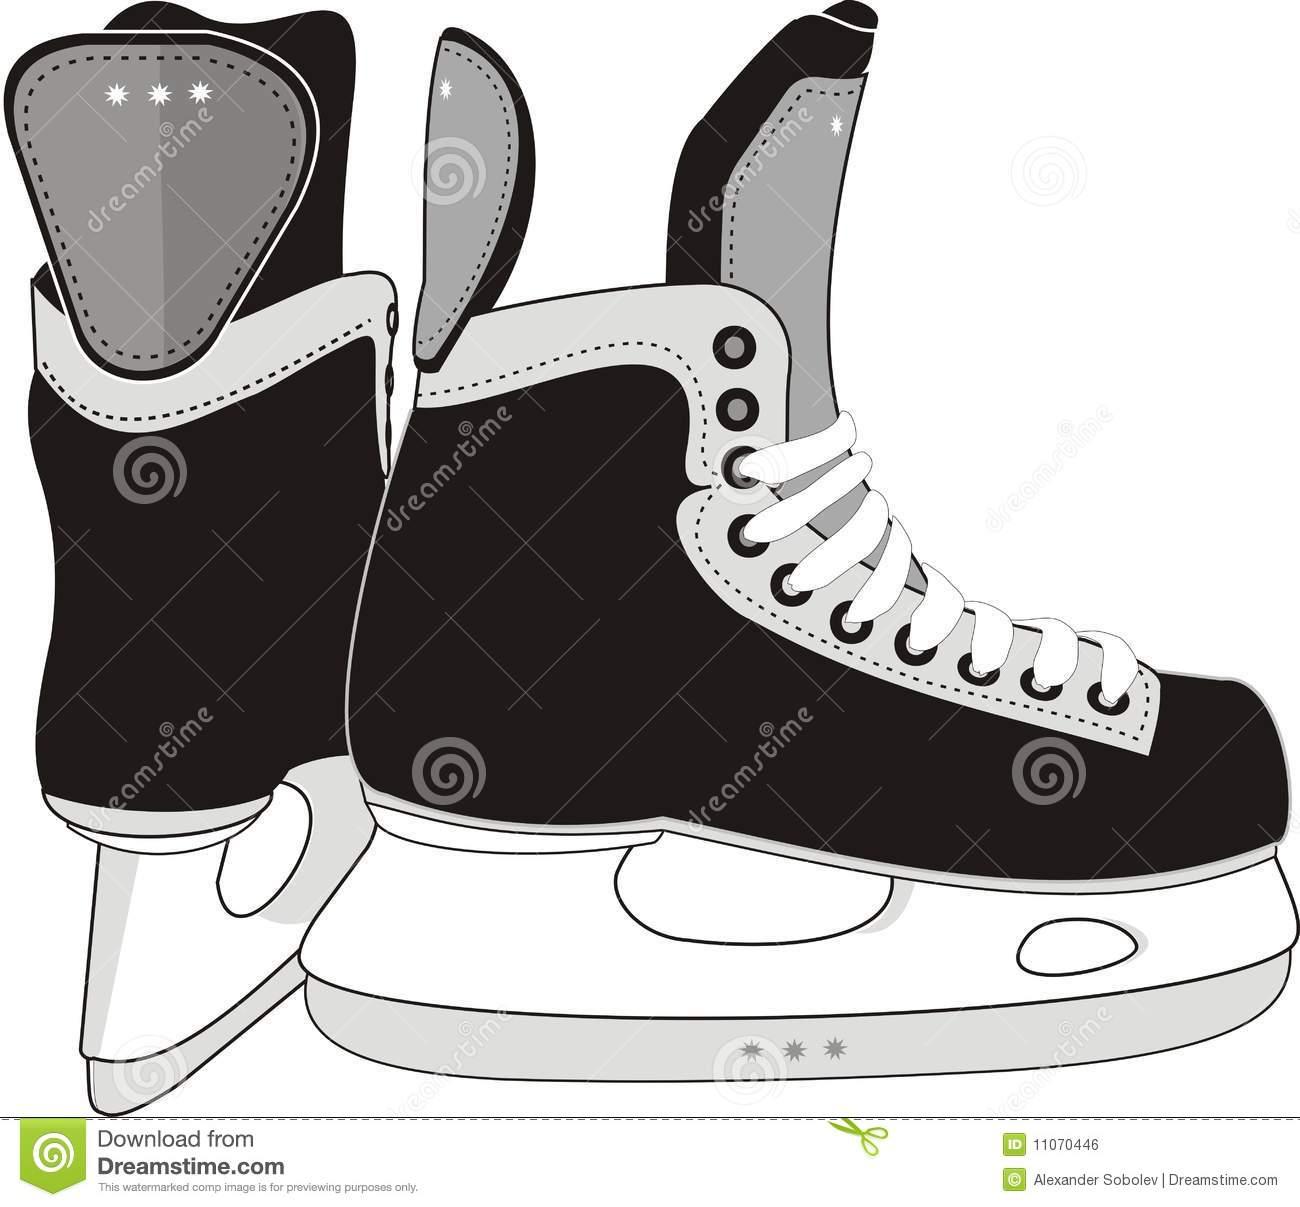 Hockey skates clip art free.